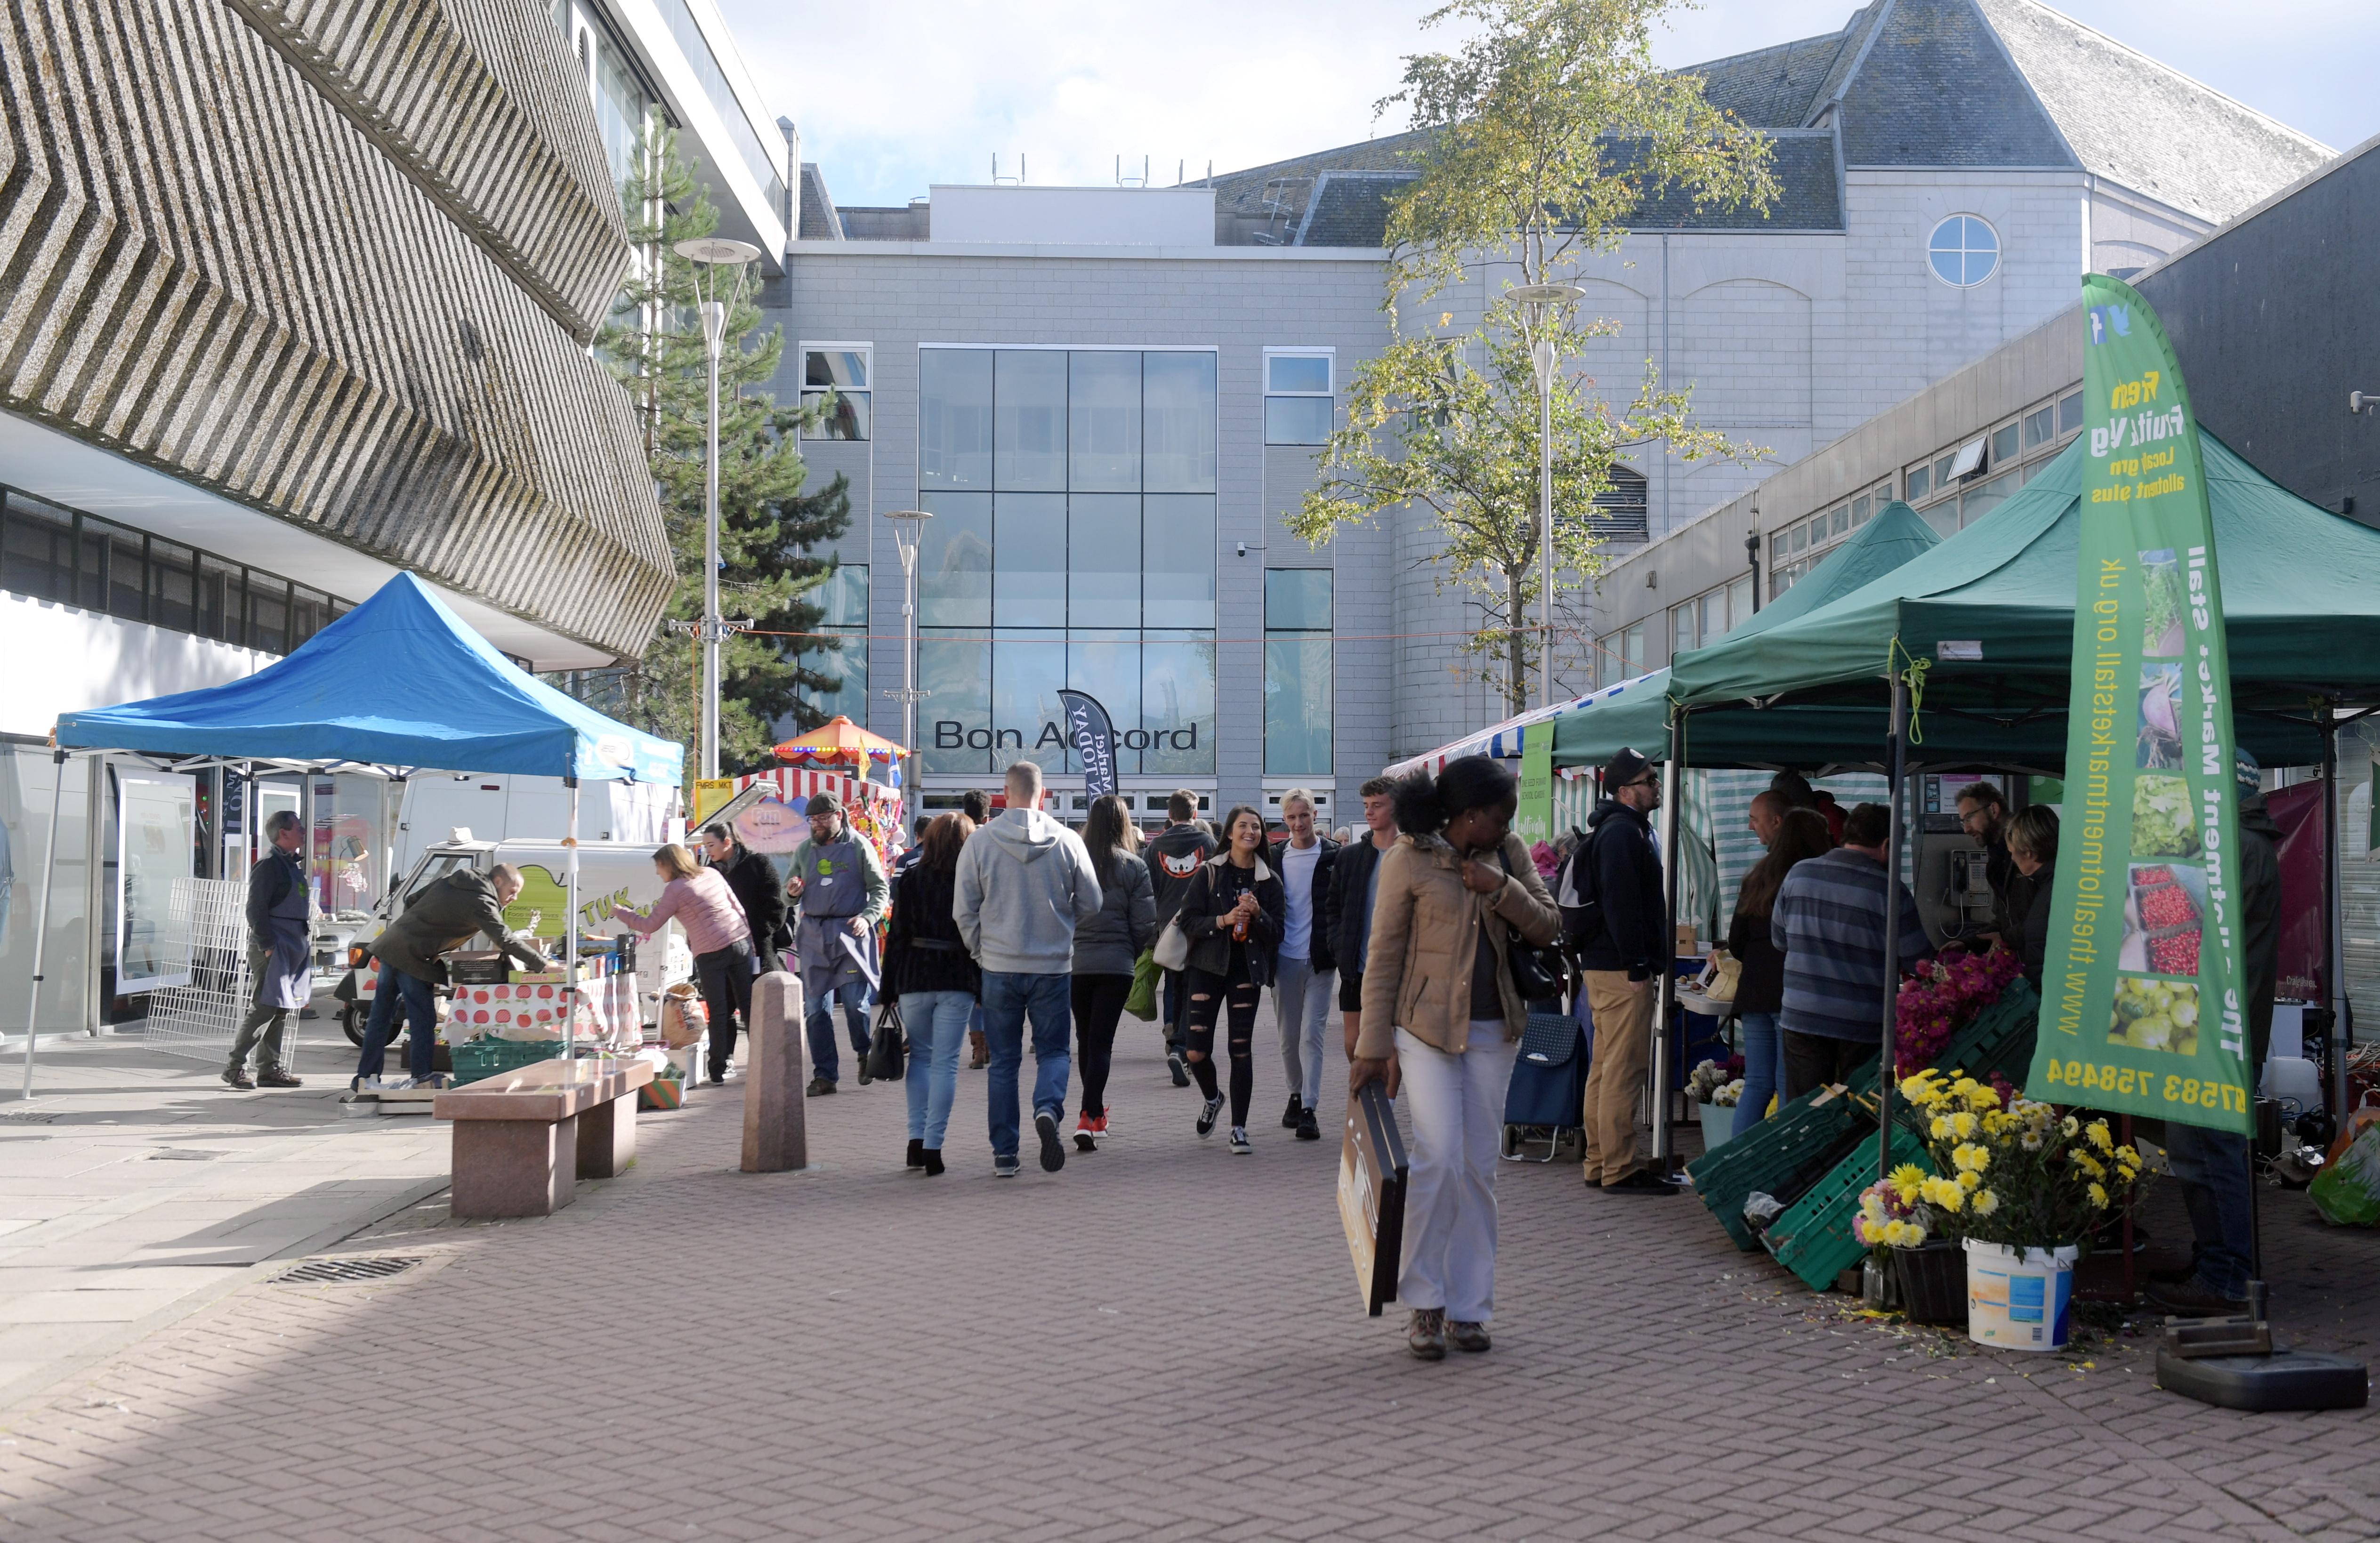 George Street market in 2018